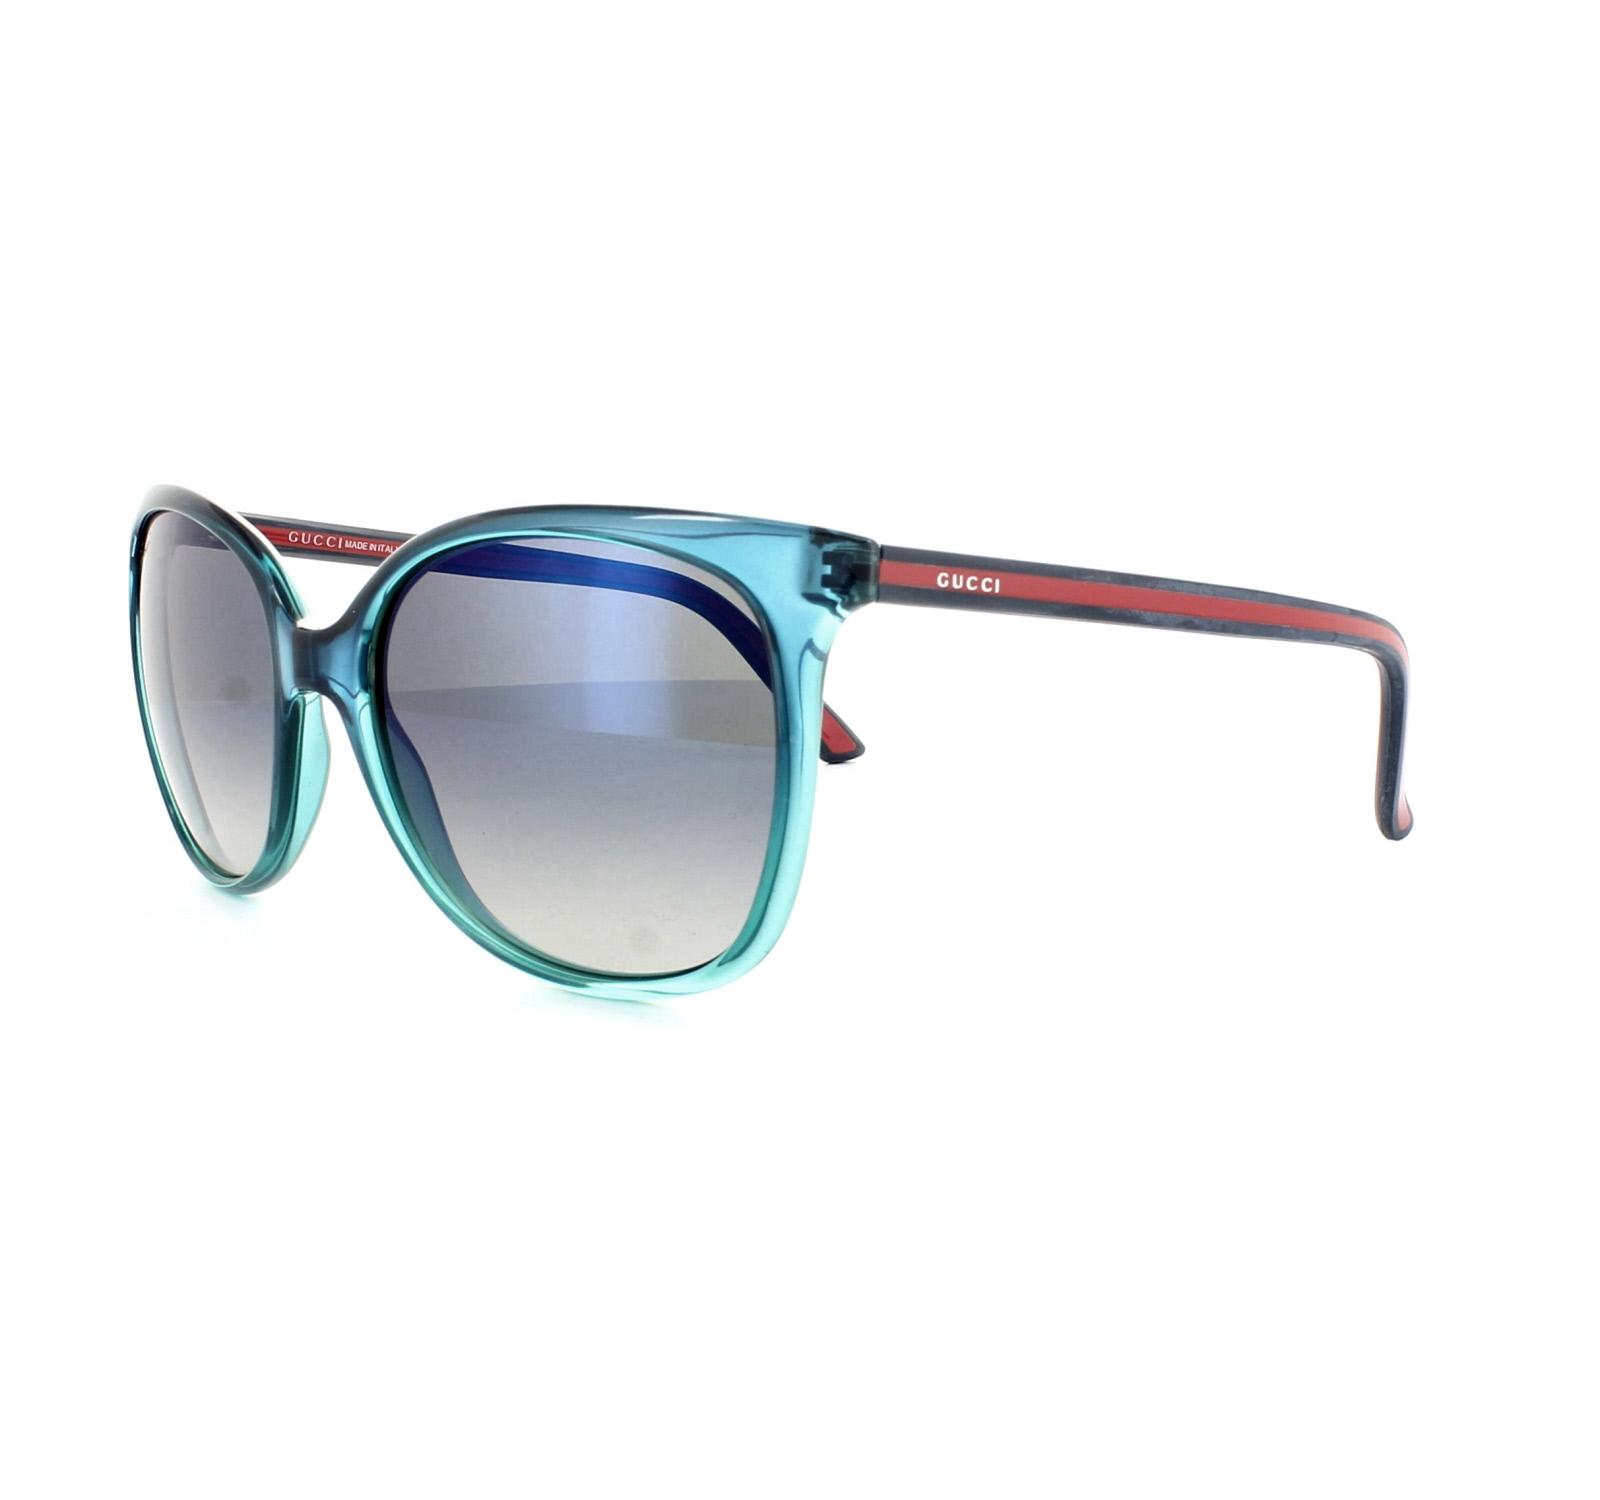 Gucci Gafas de sol 3649 836 DK Azul Cristal Azul Degradado | eBay